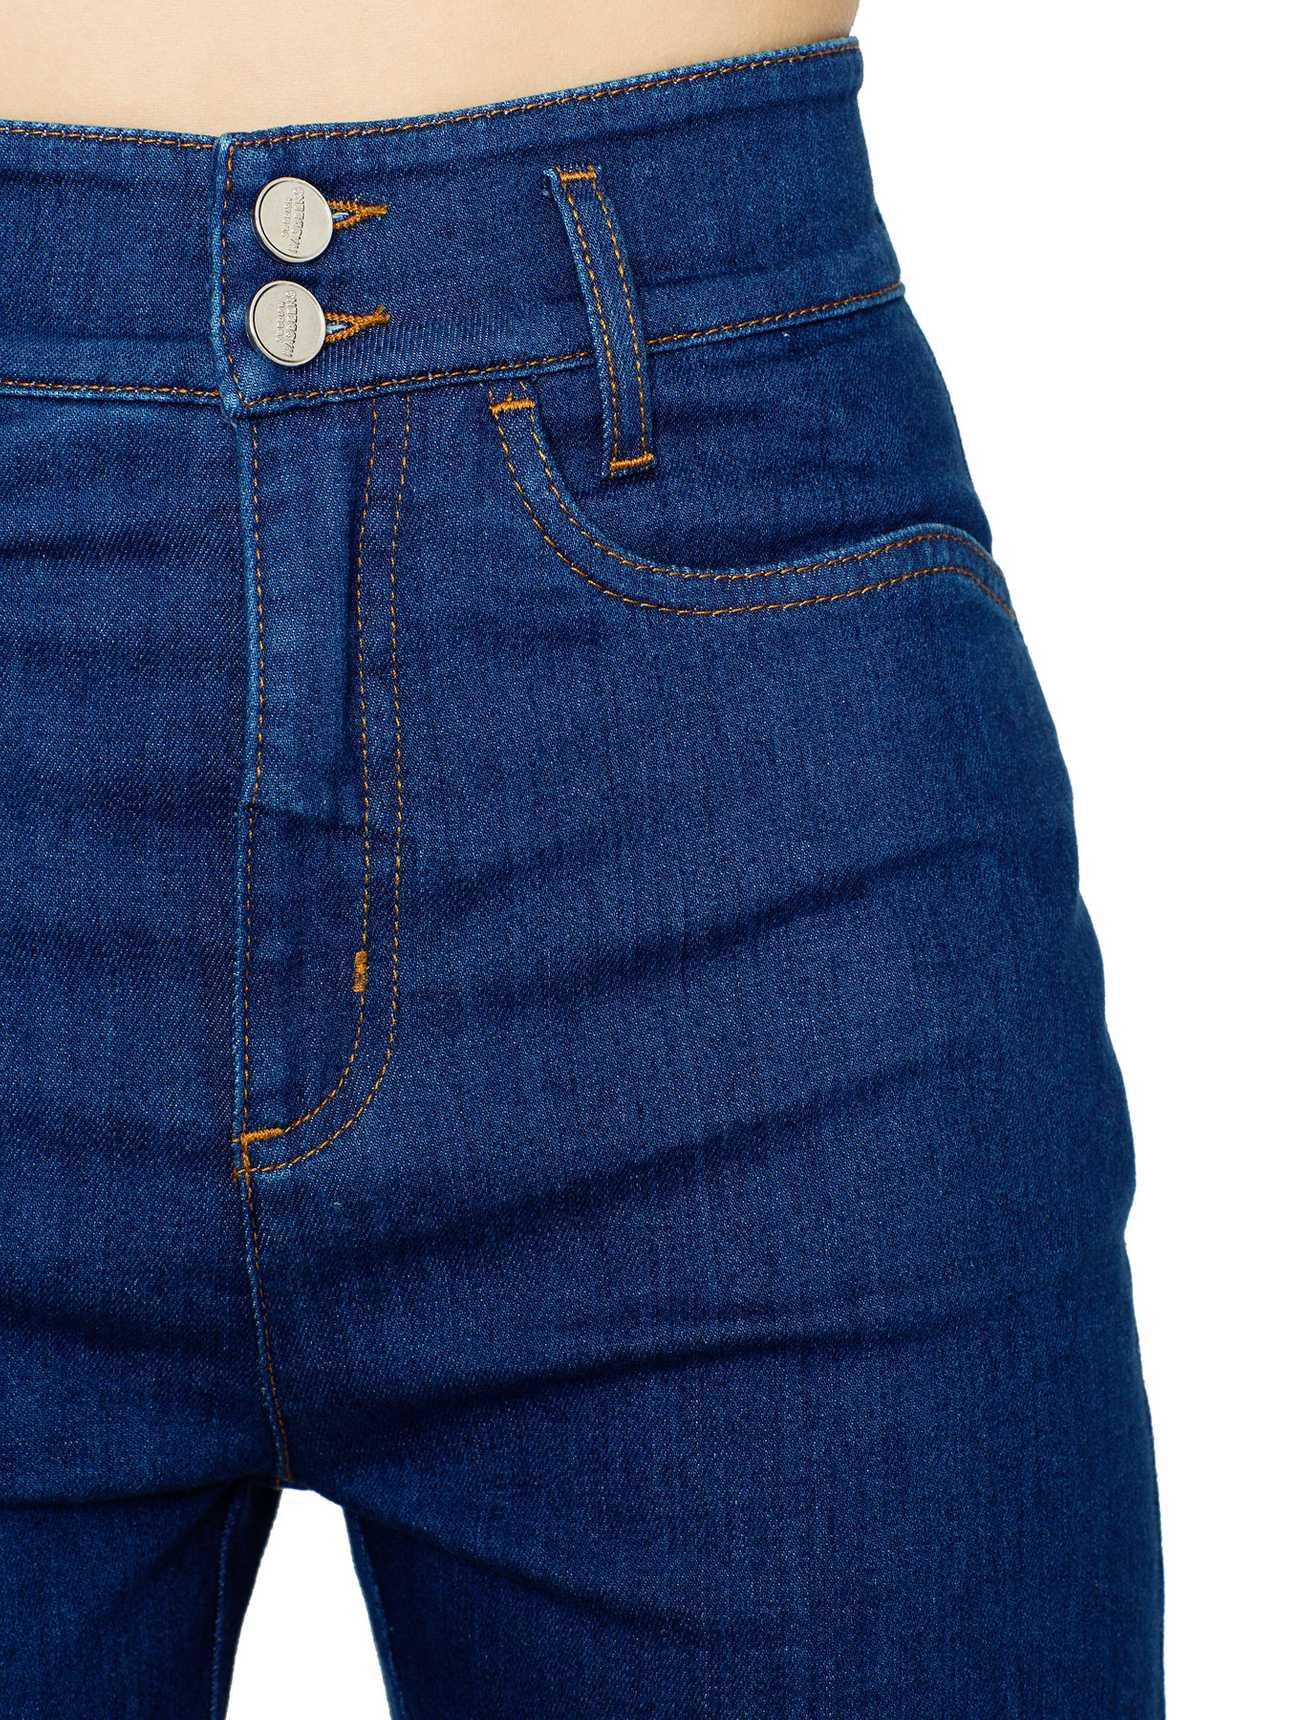 Product image Flare Jeans Denim